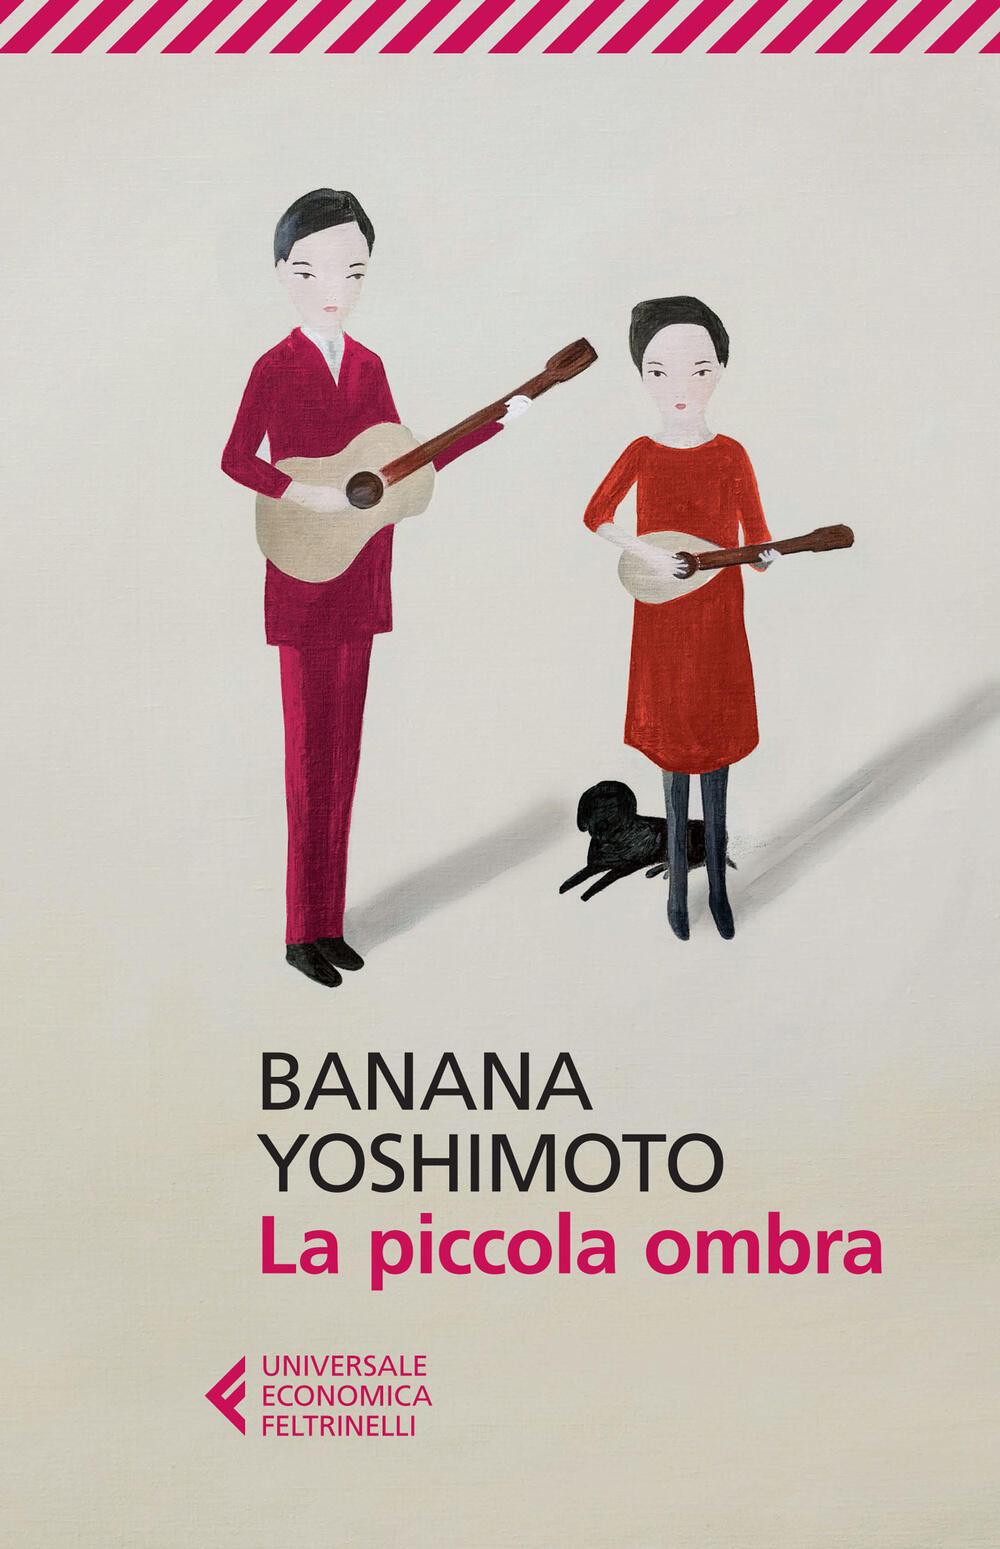 La piccola ombra banana yoshimoto libro feltrinelli - Il giardino segreto banana yoshimoto ...